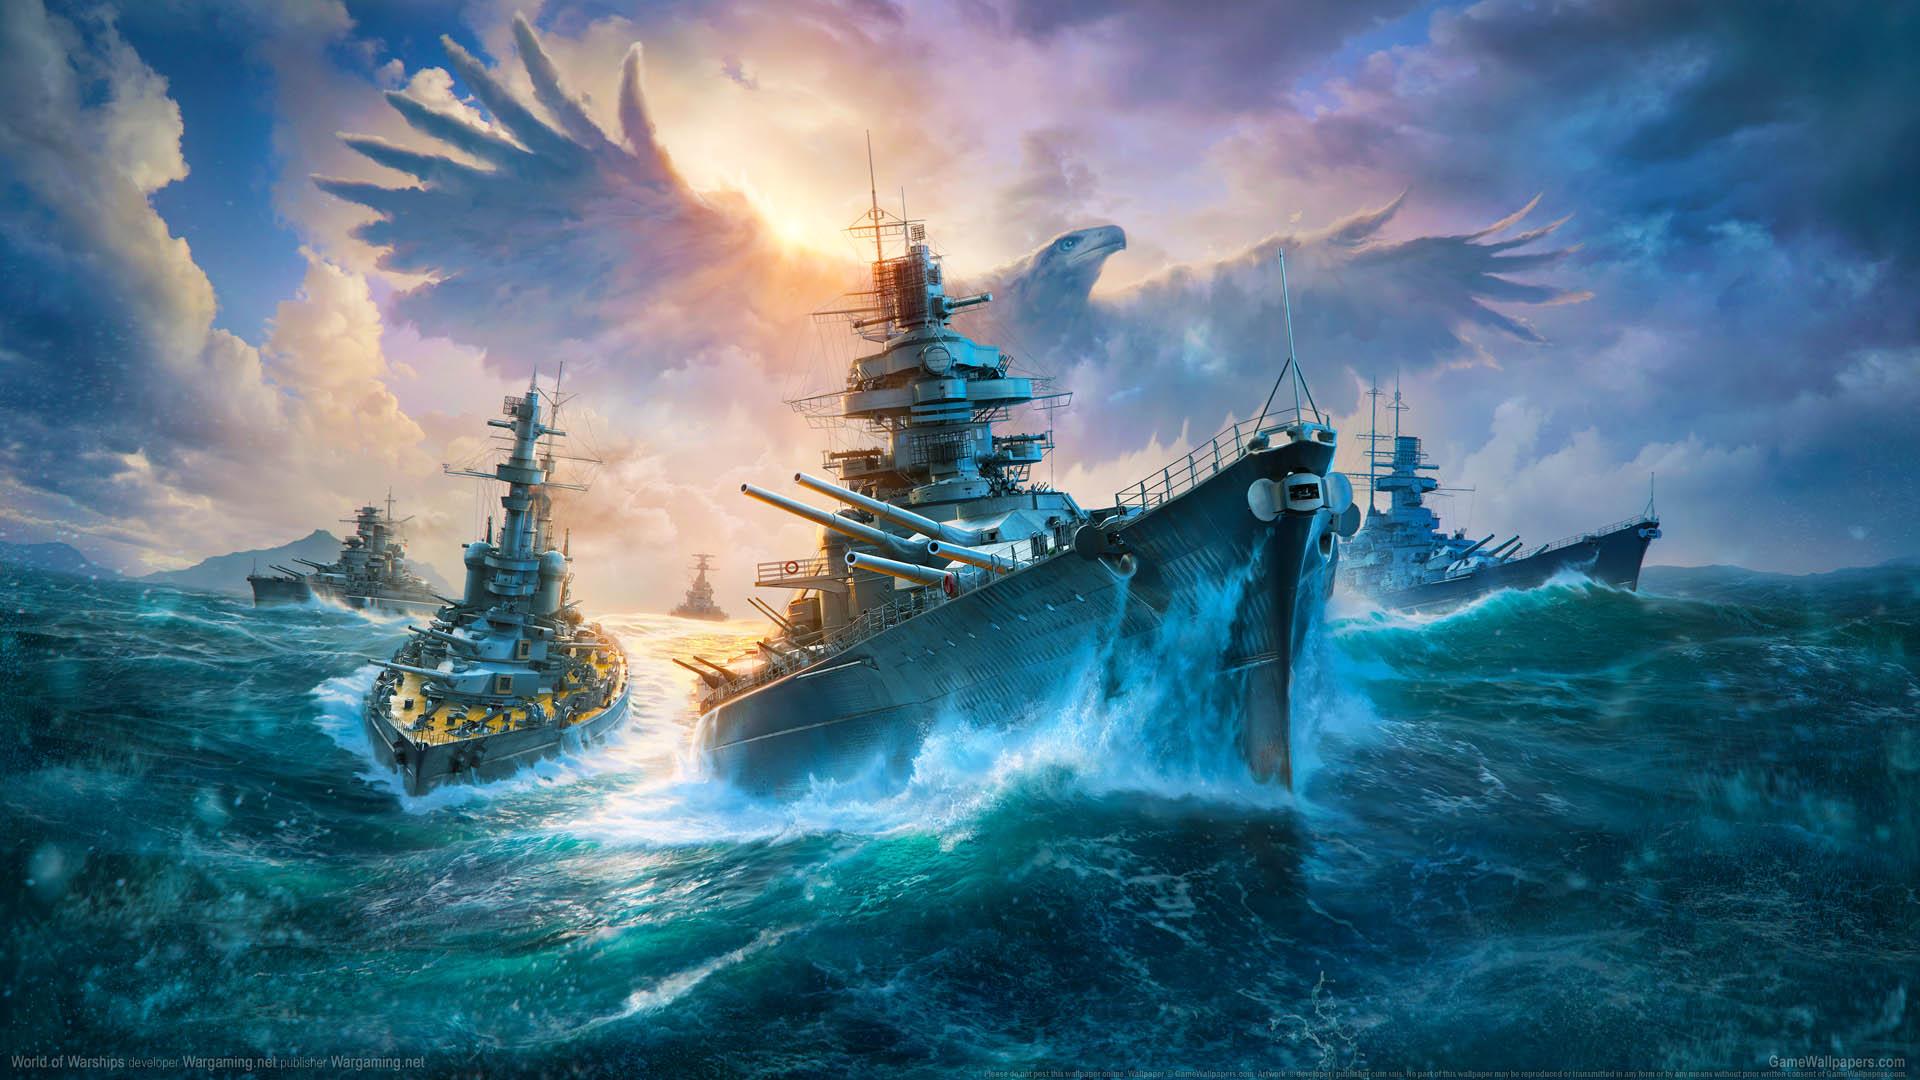 World of Warships fond d'écran 18 1920x1080